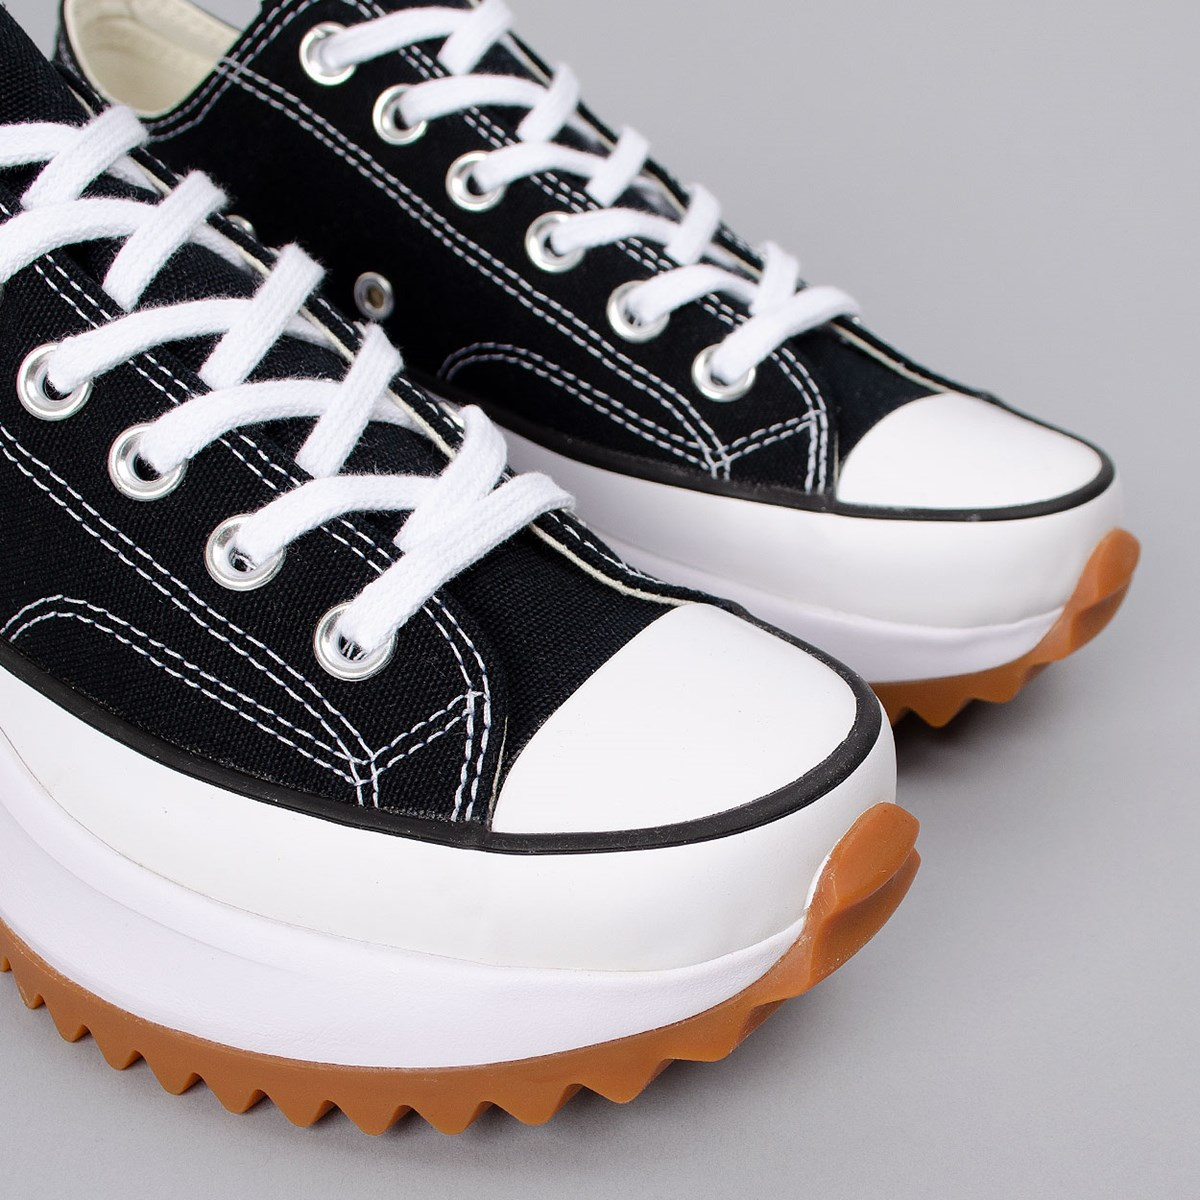 Tênis Converse Run Star Hike Ox Foundational Canvas Black White 168816C